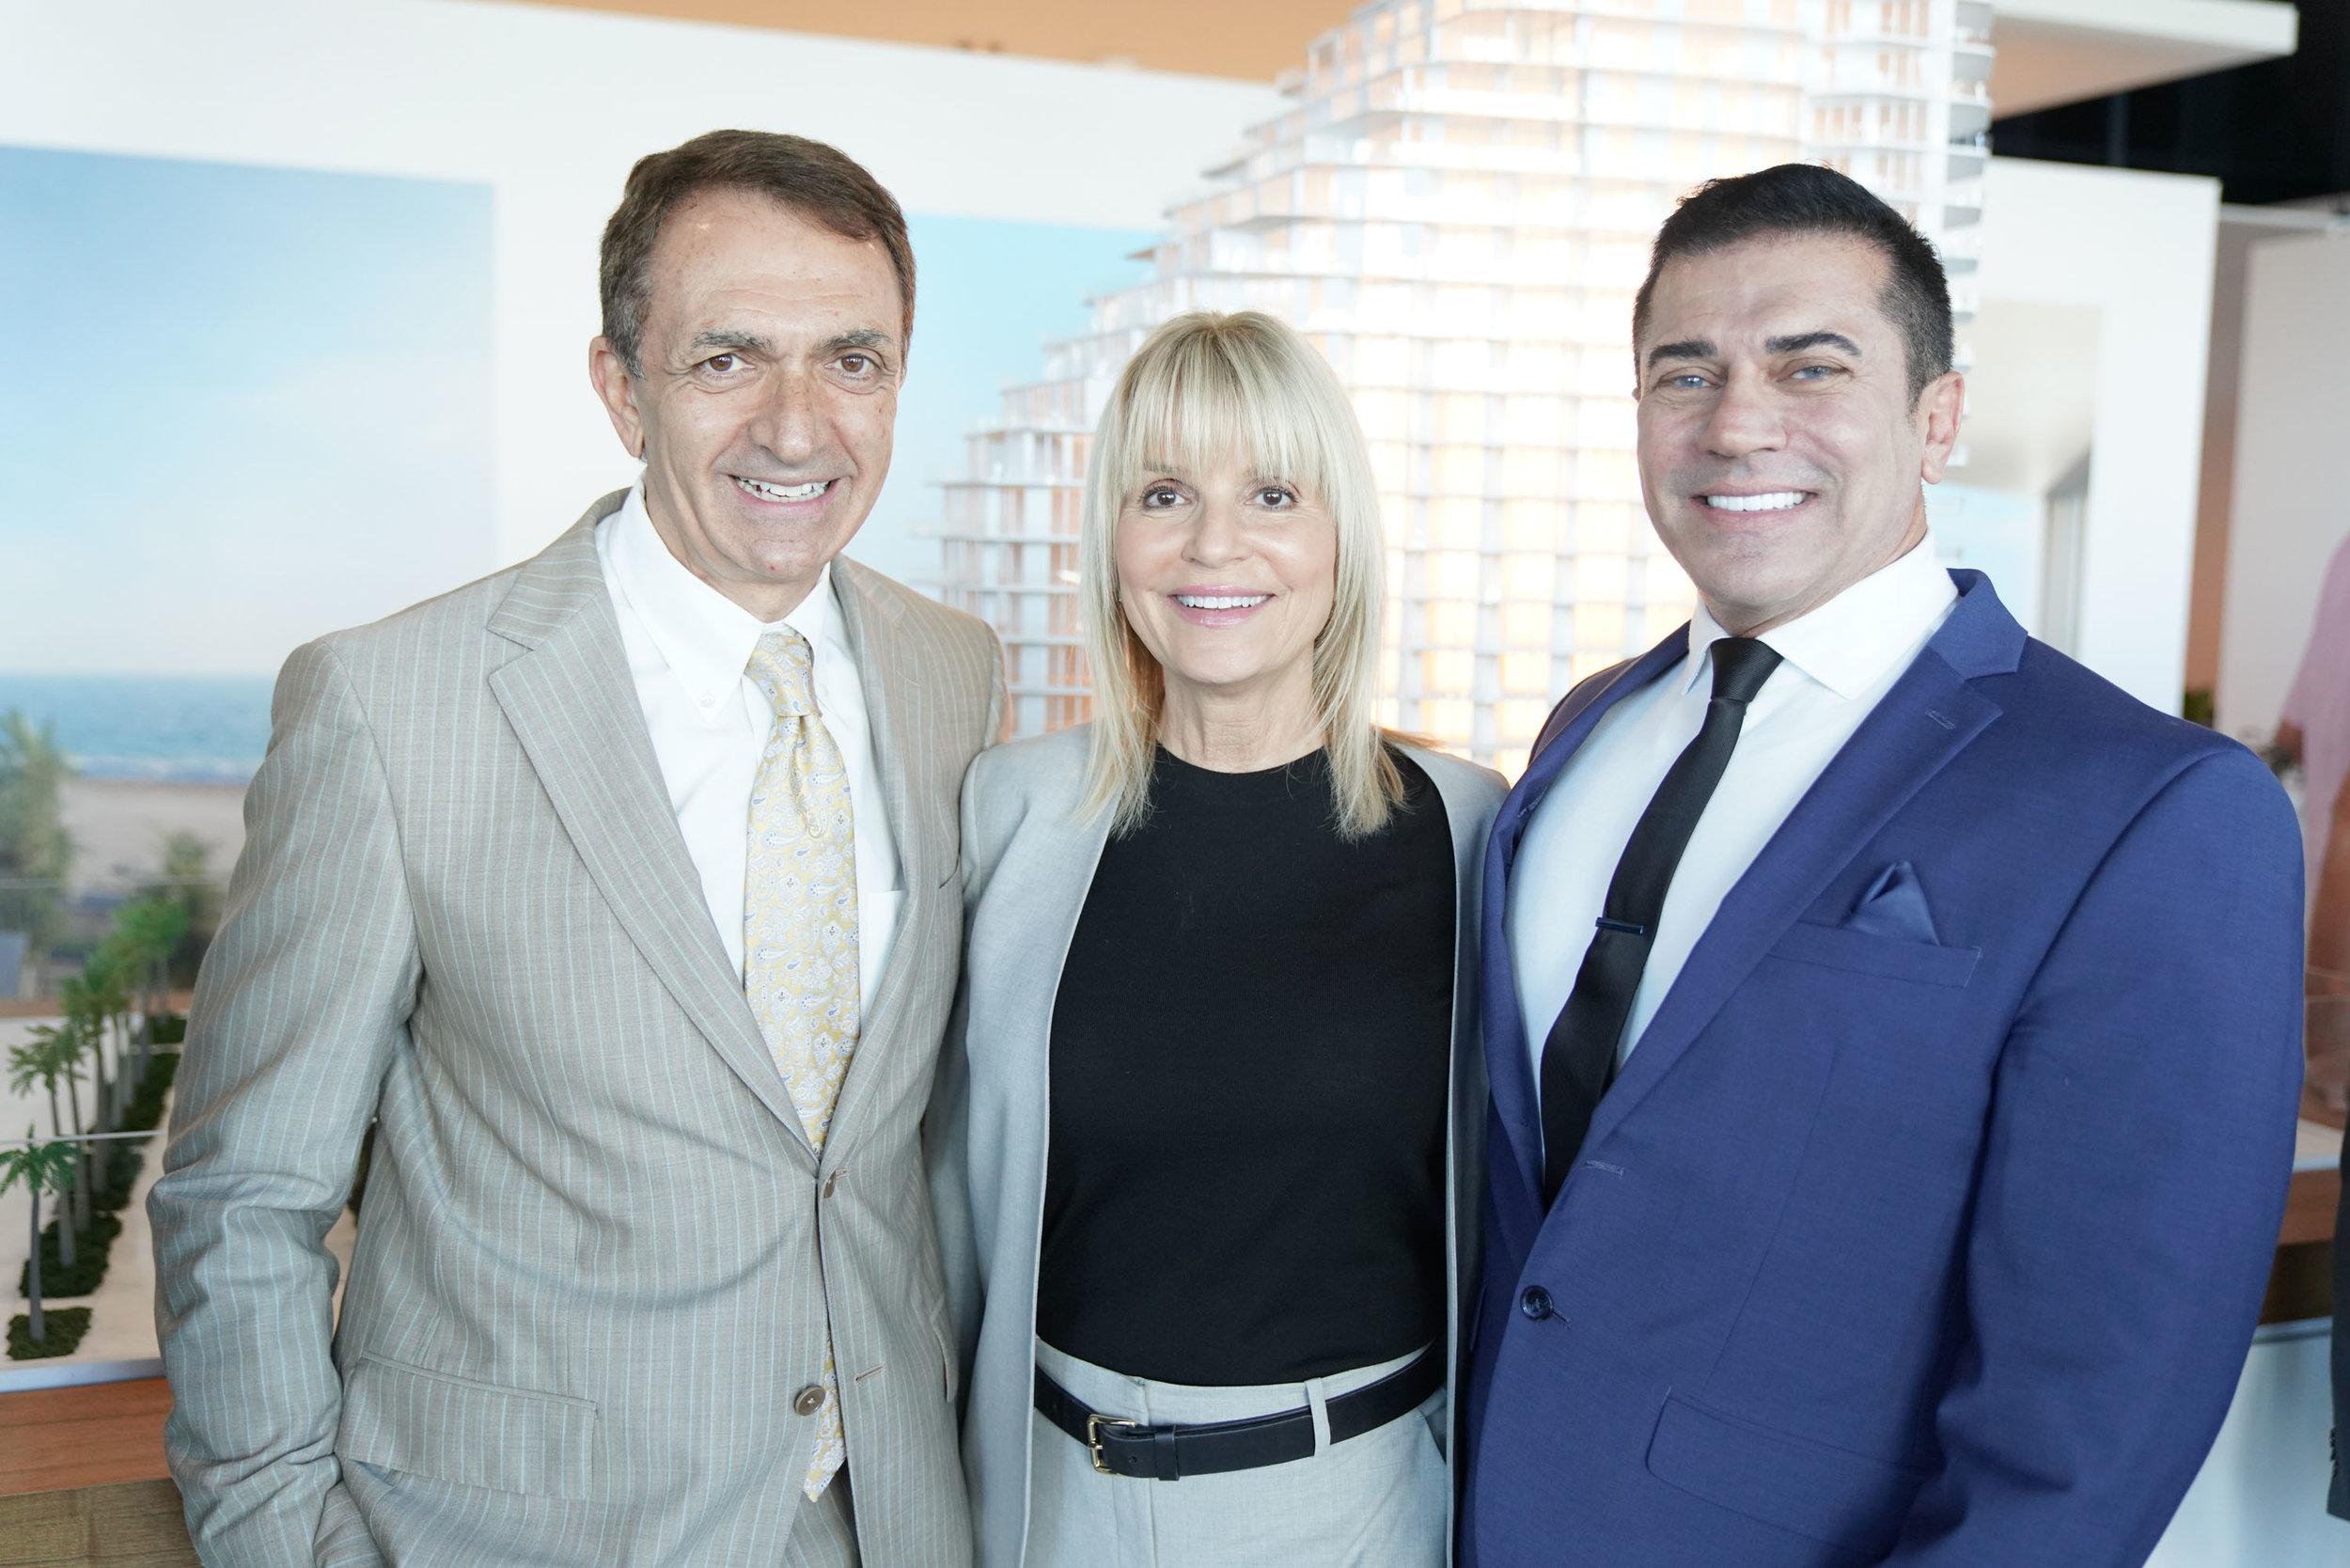 Mayor Dean Trantalis, Caprice Weber, & Dan Teixeira